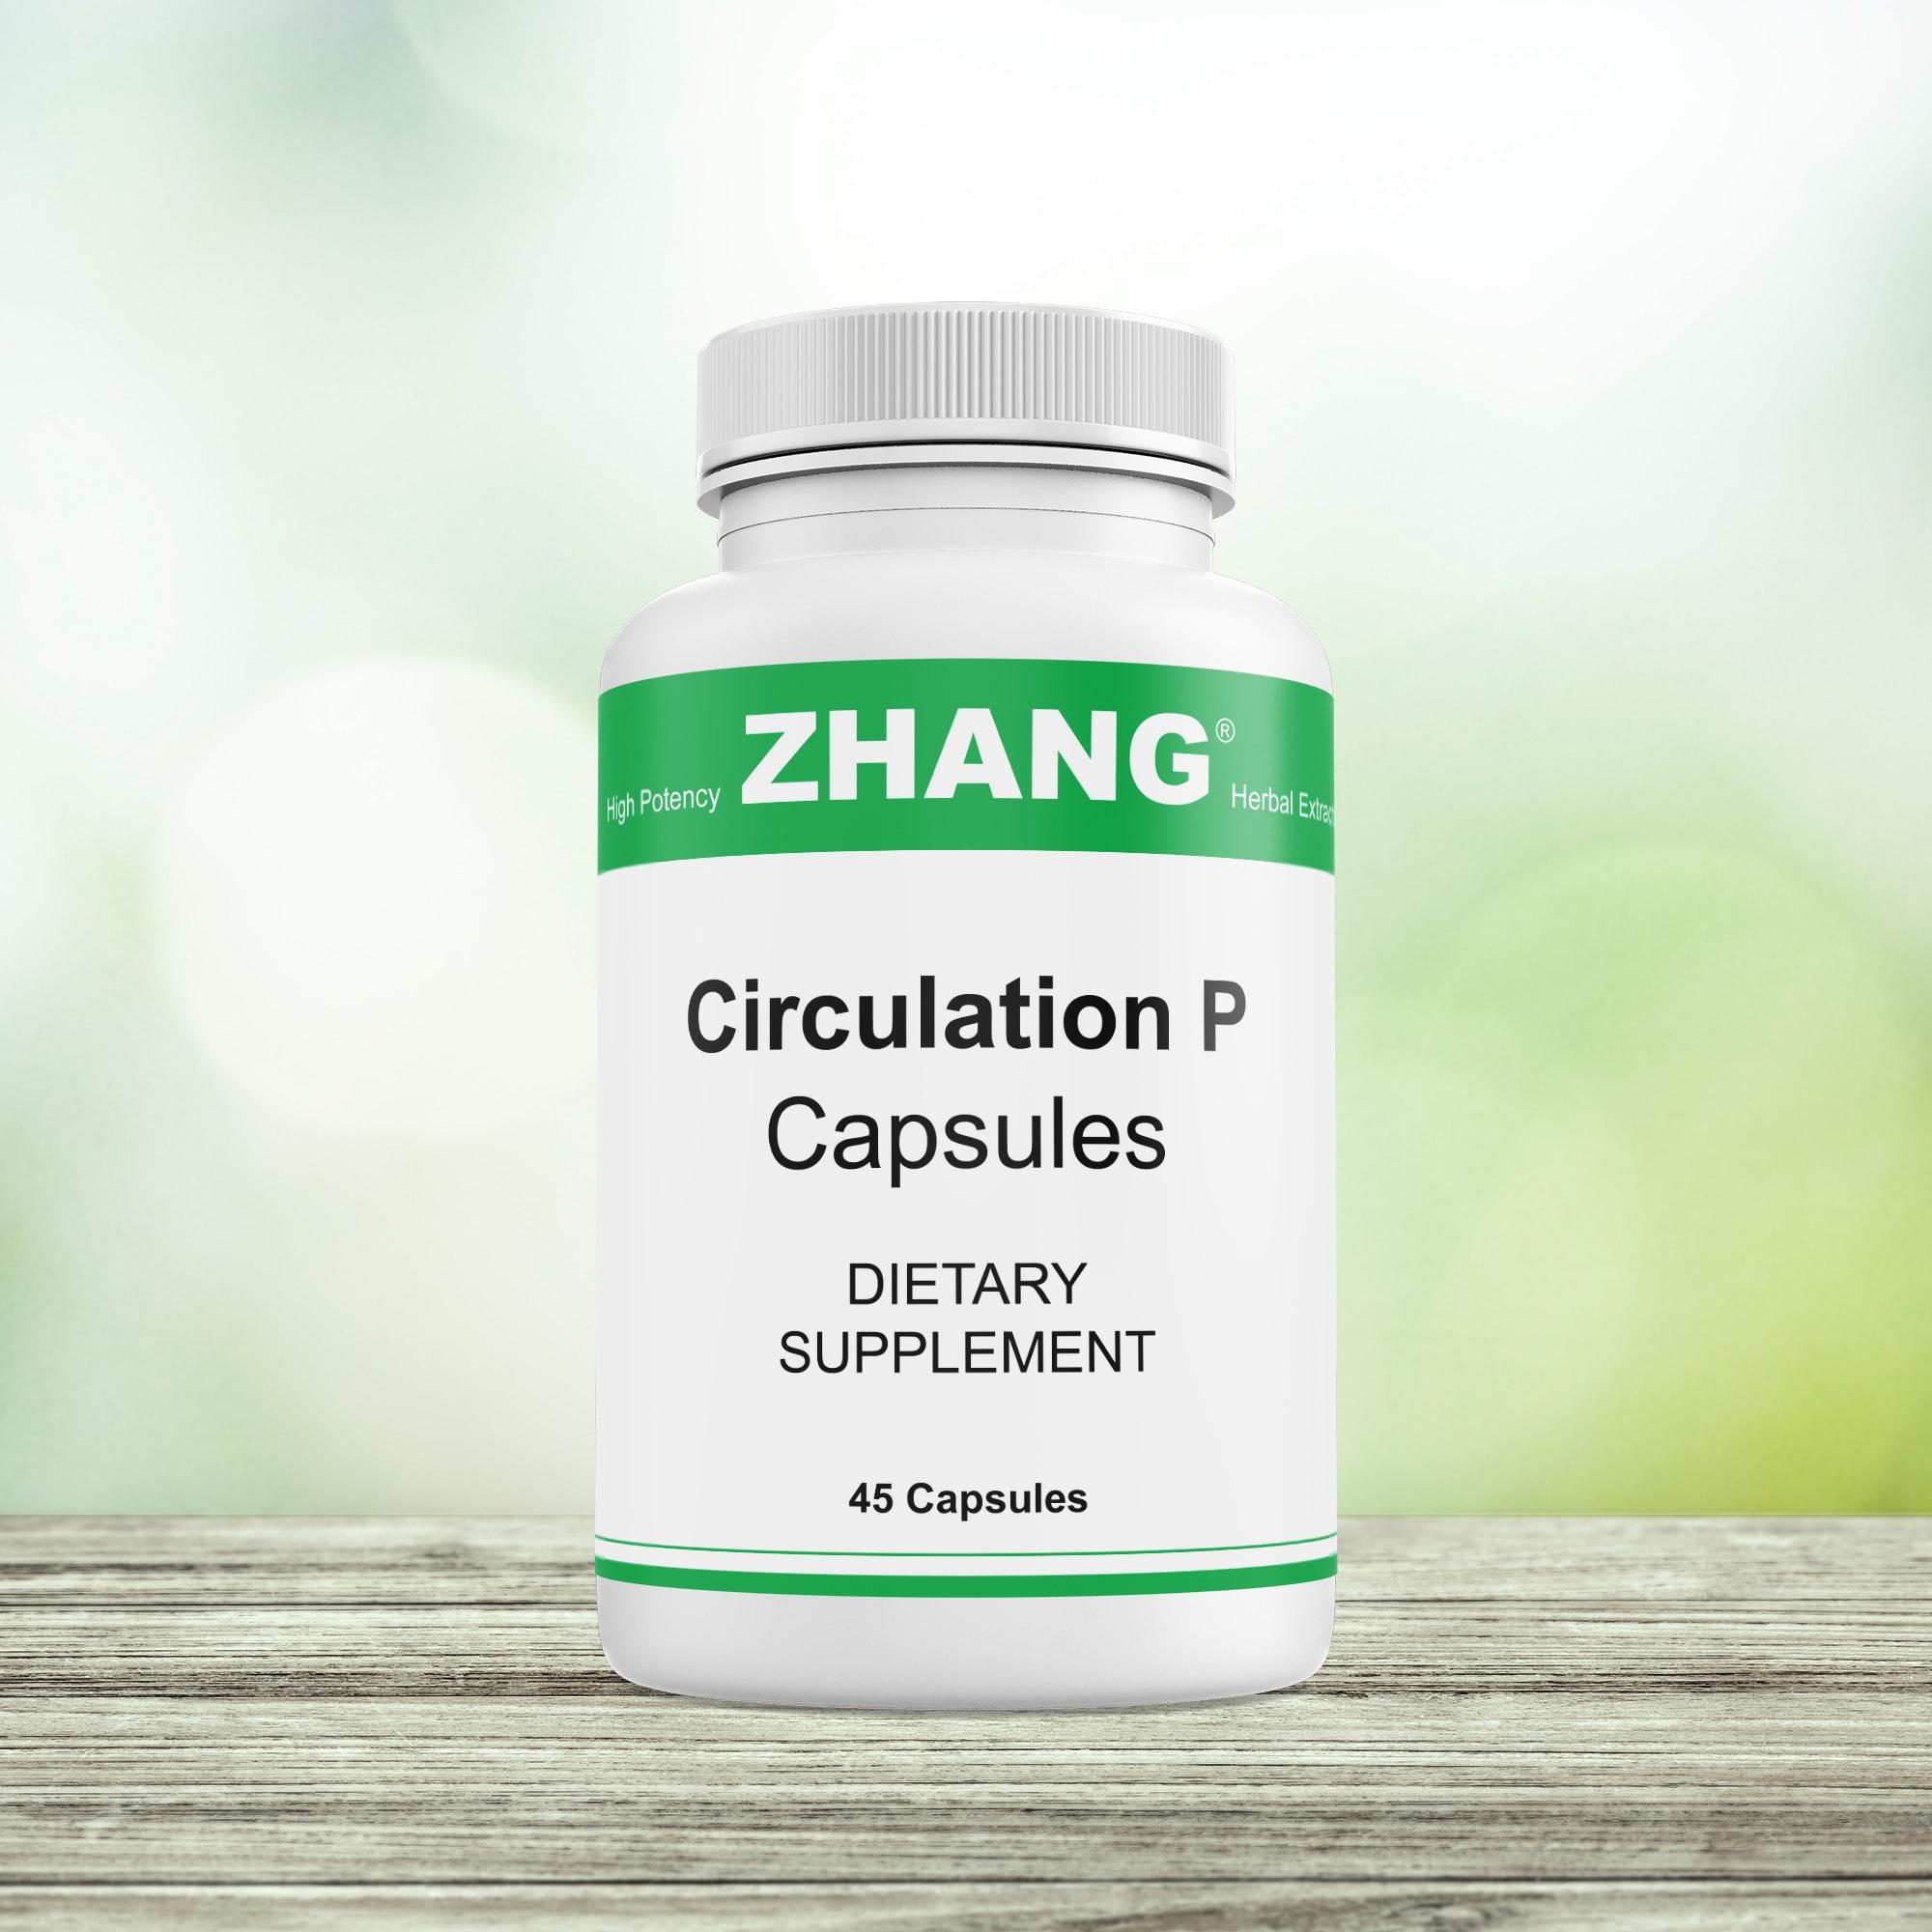 Circulation P Capsules